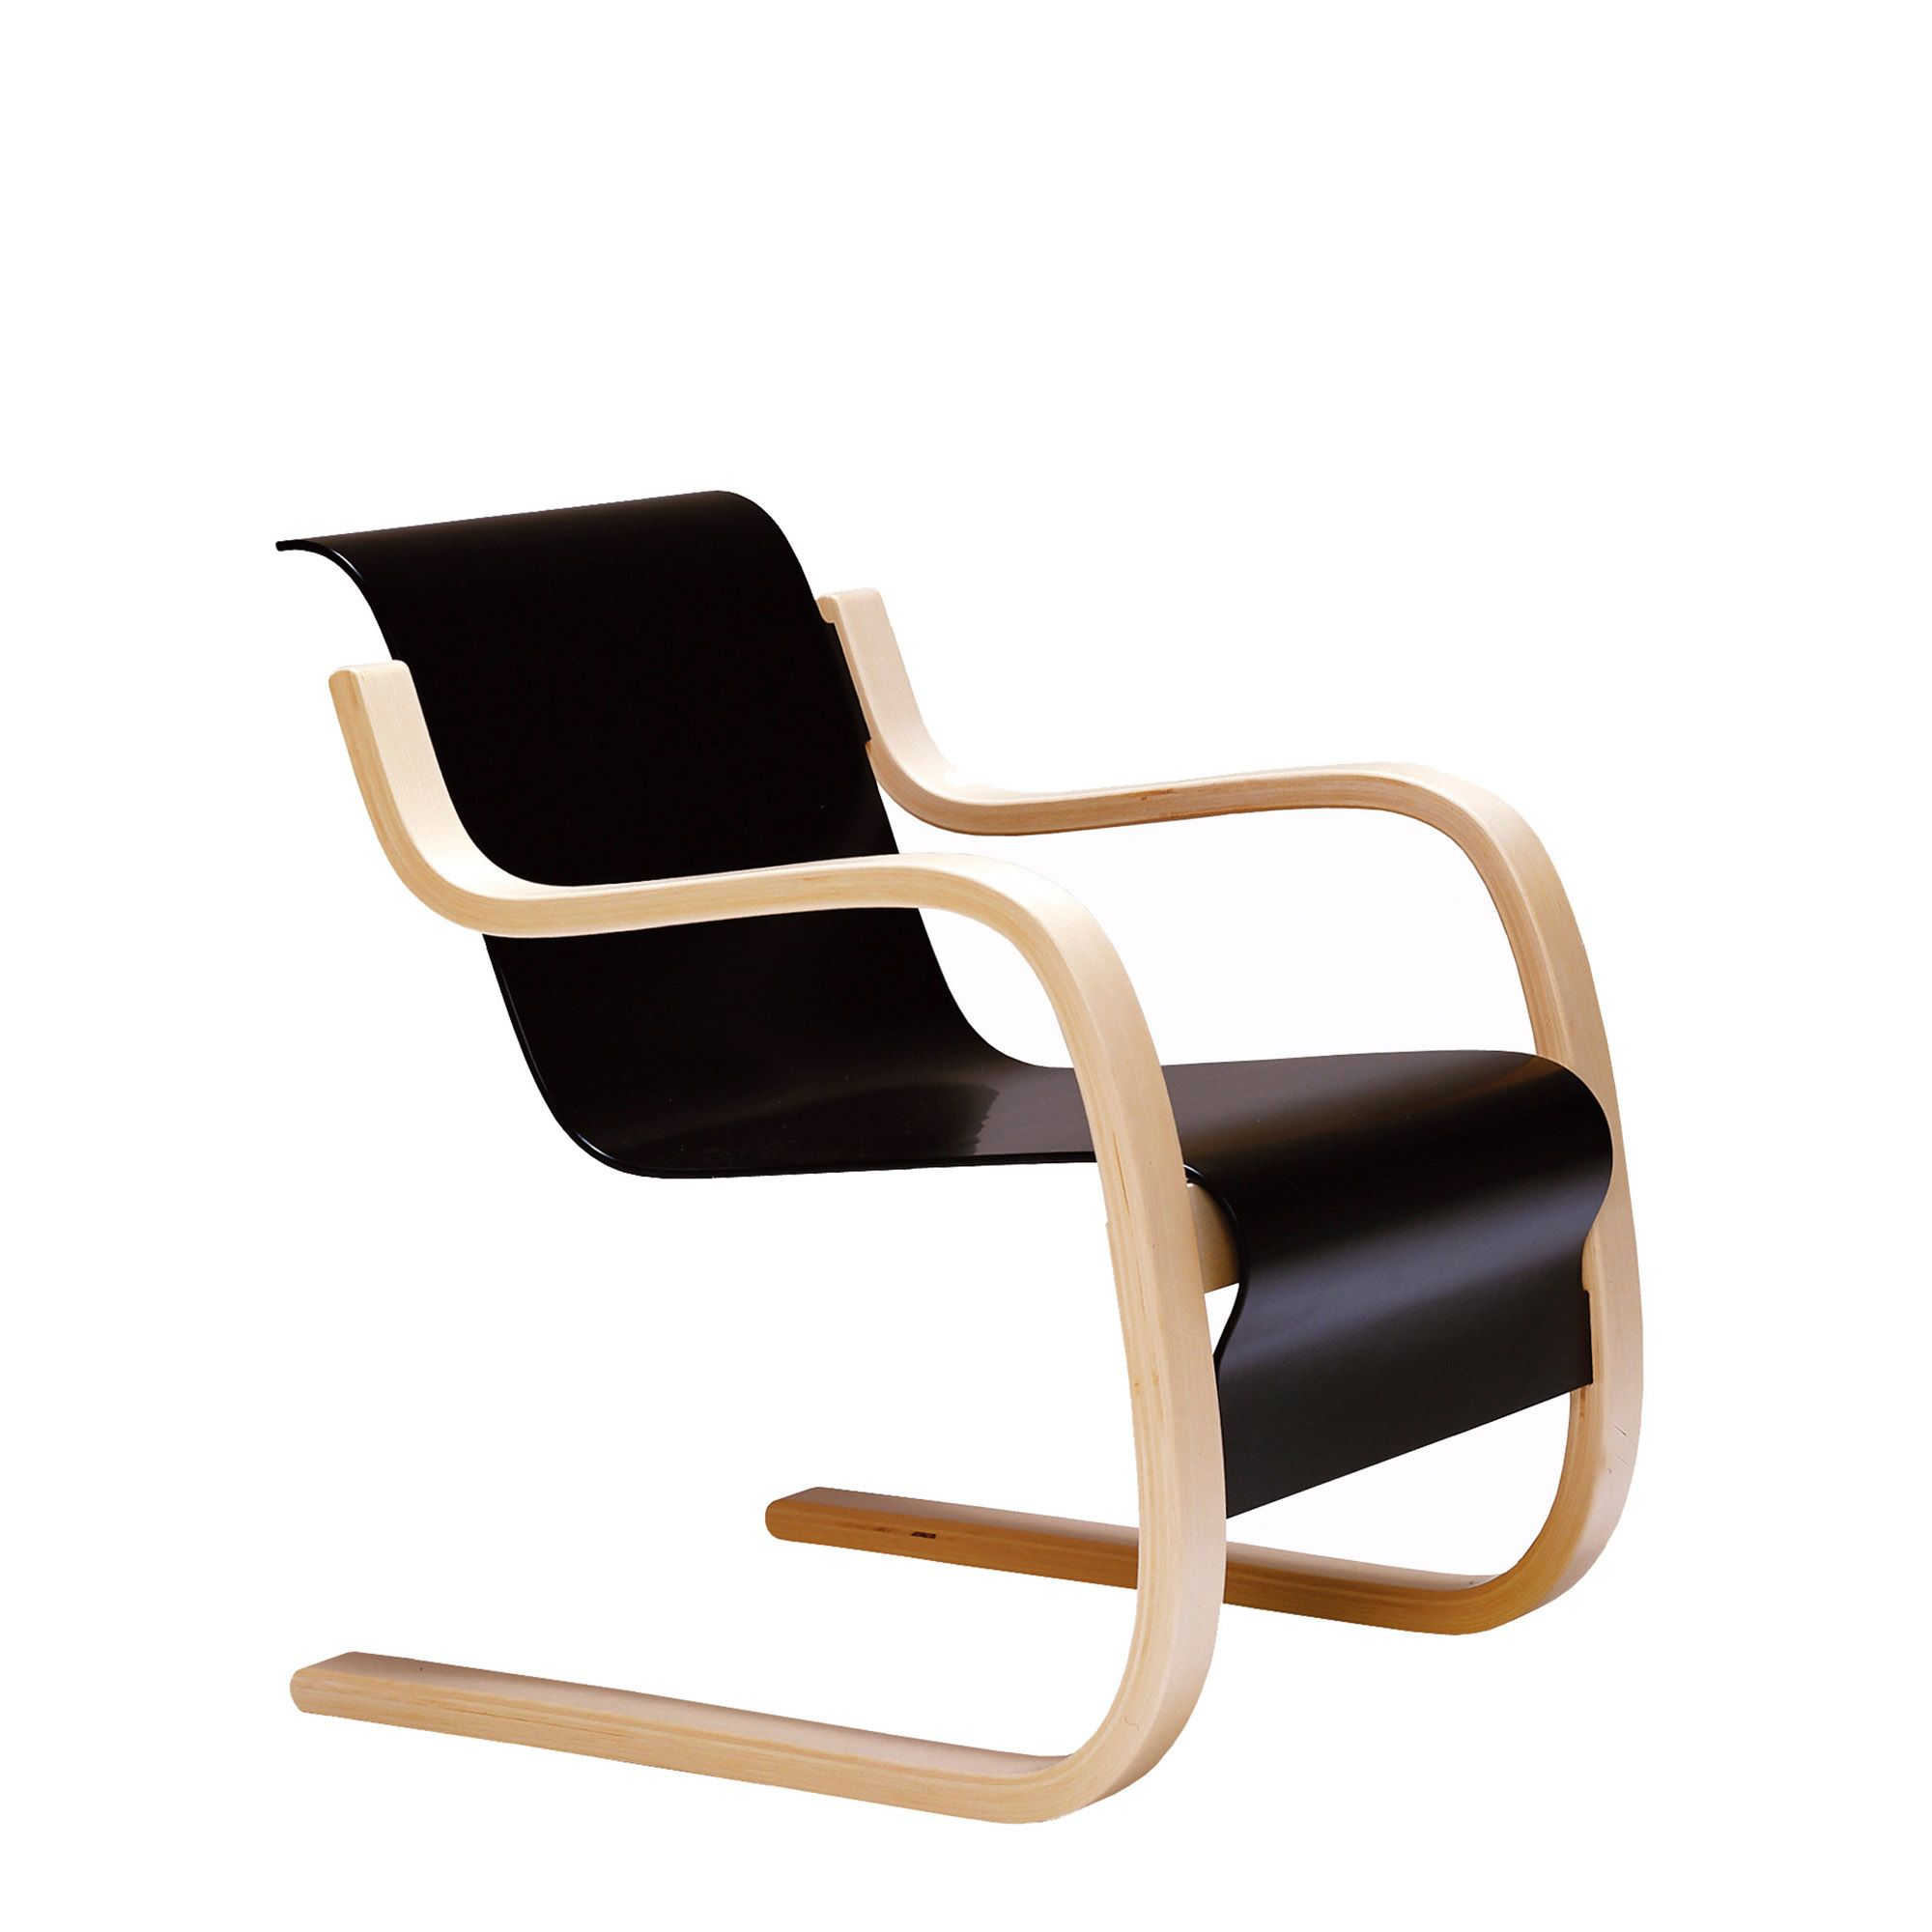 Armchair-42-black-lacquer_WEB-1975912.jpg